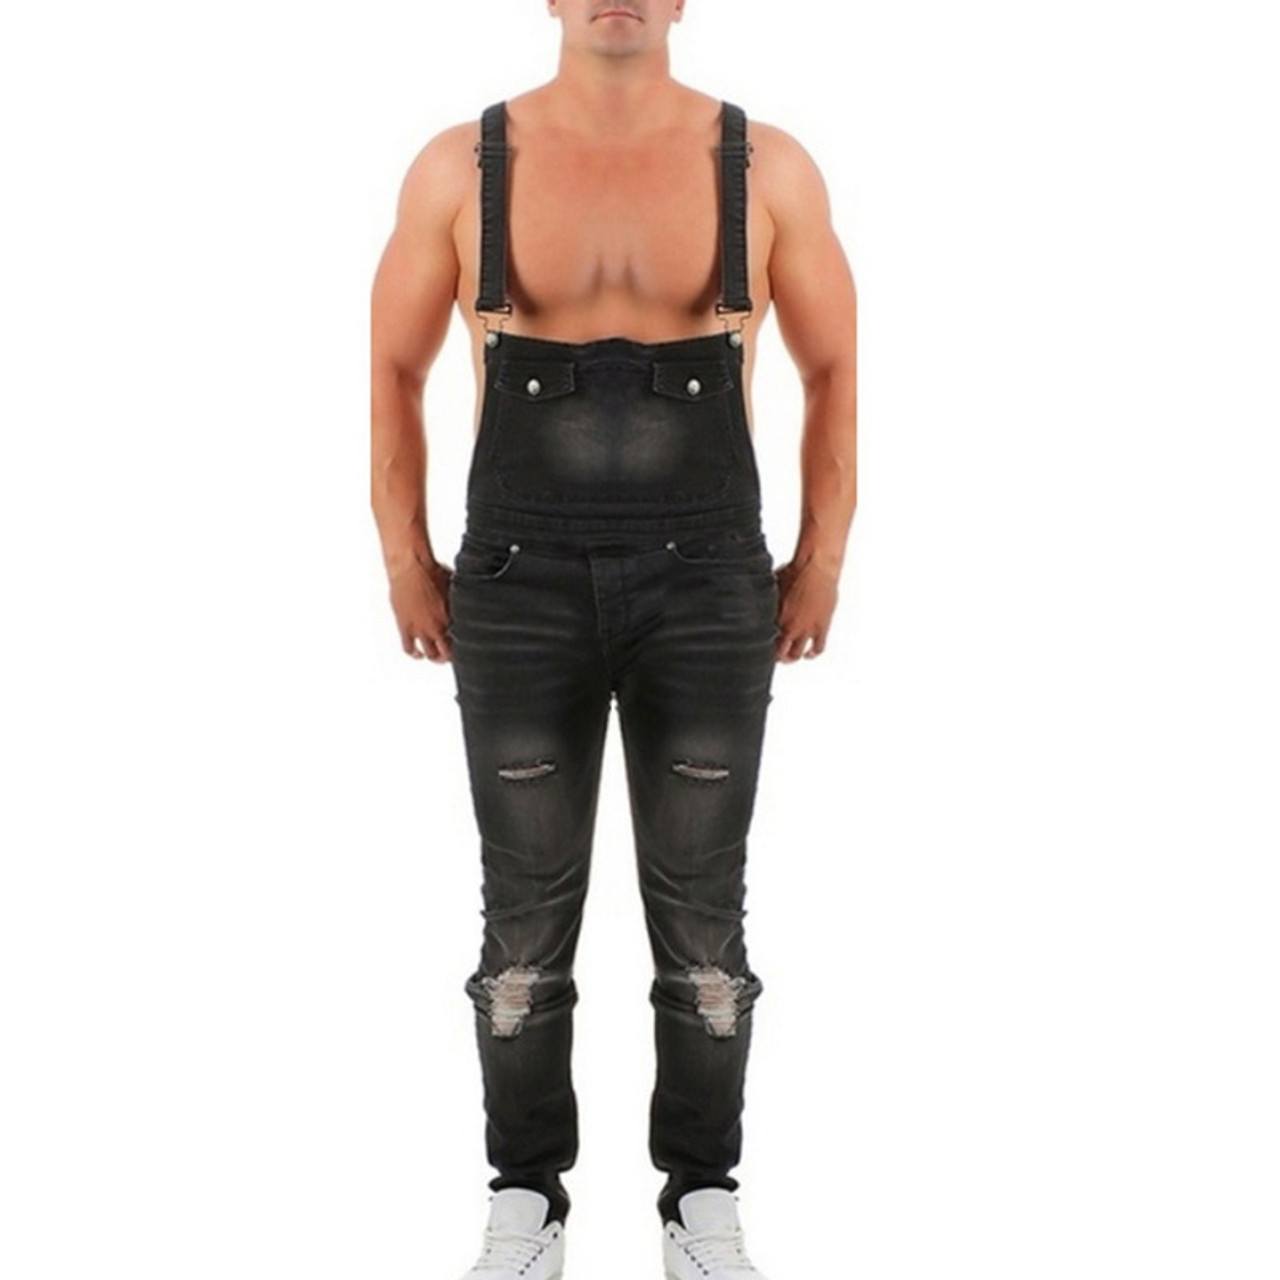 9b6a0cedaeb6 ... MoneRffi Mens Ripped Jeans Jumpsuits Spring Autumn Skinny Distressed  Denim Bib Overalls Male Suspender Pant Streetwear ...